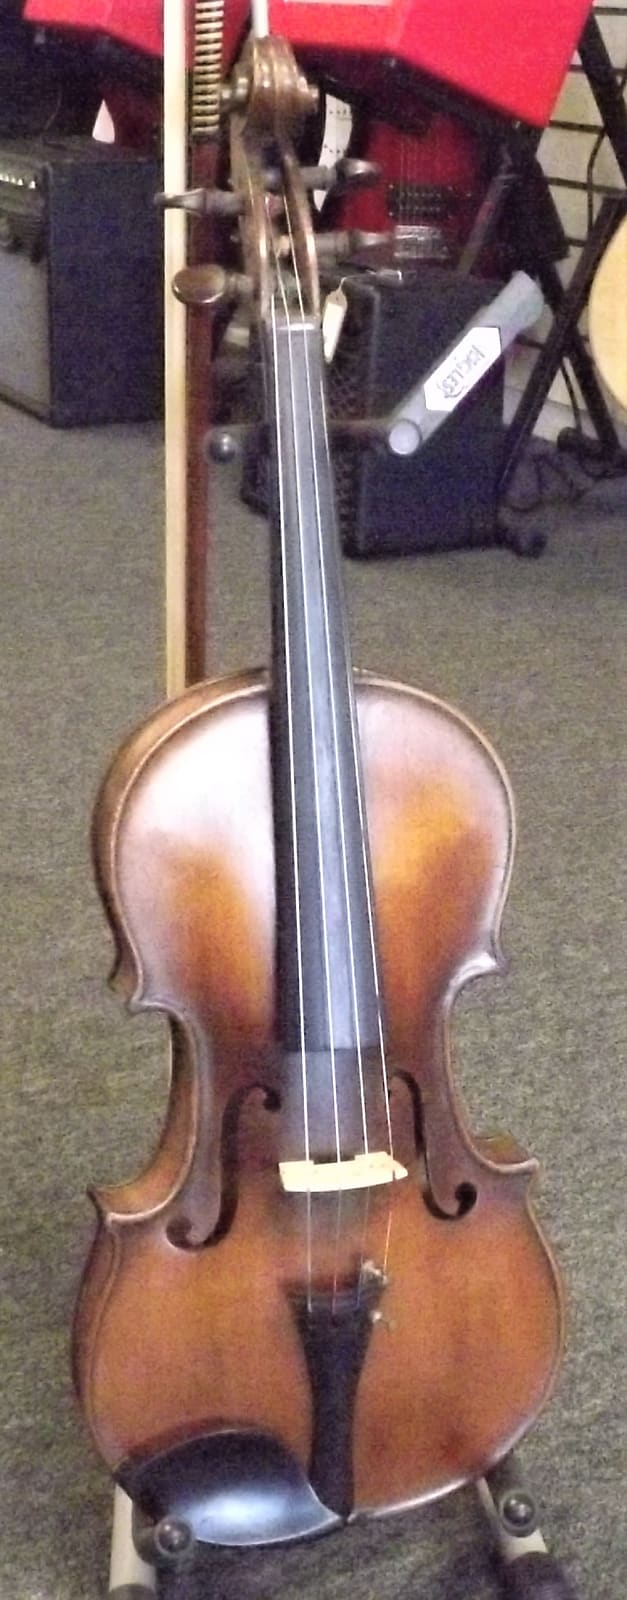 Jerome Thibouville-Lamy Nicolaus Amatus 1911 Violin, Case & Bow